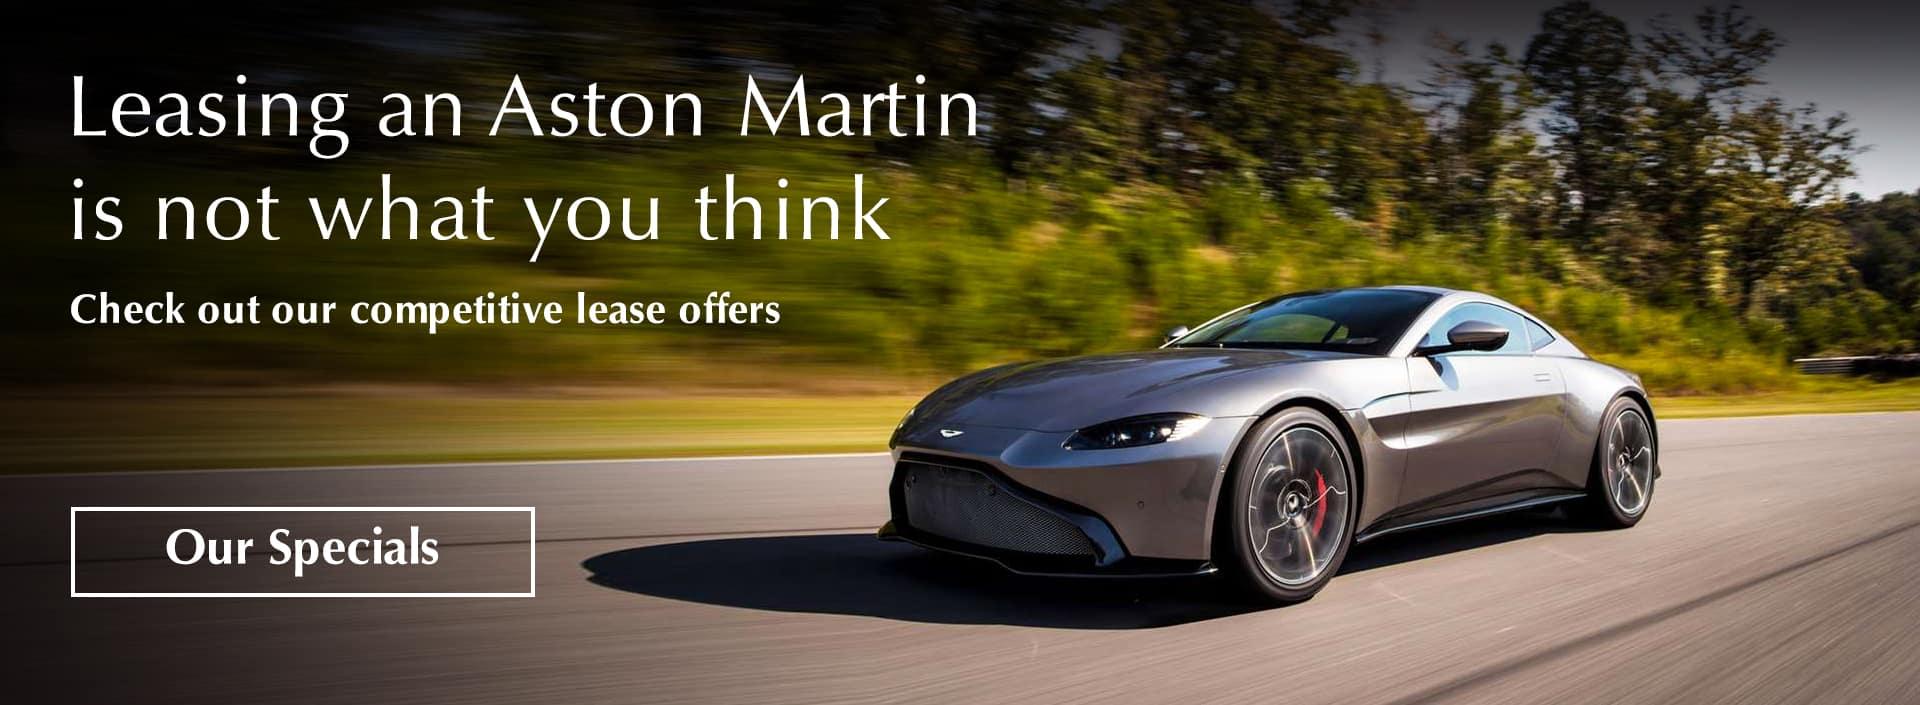 Aston Martin Lease Specials